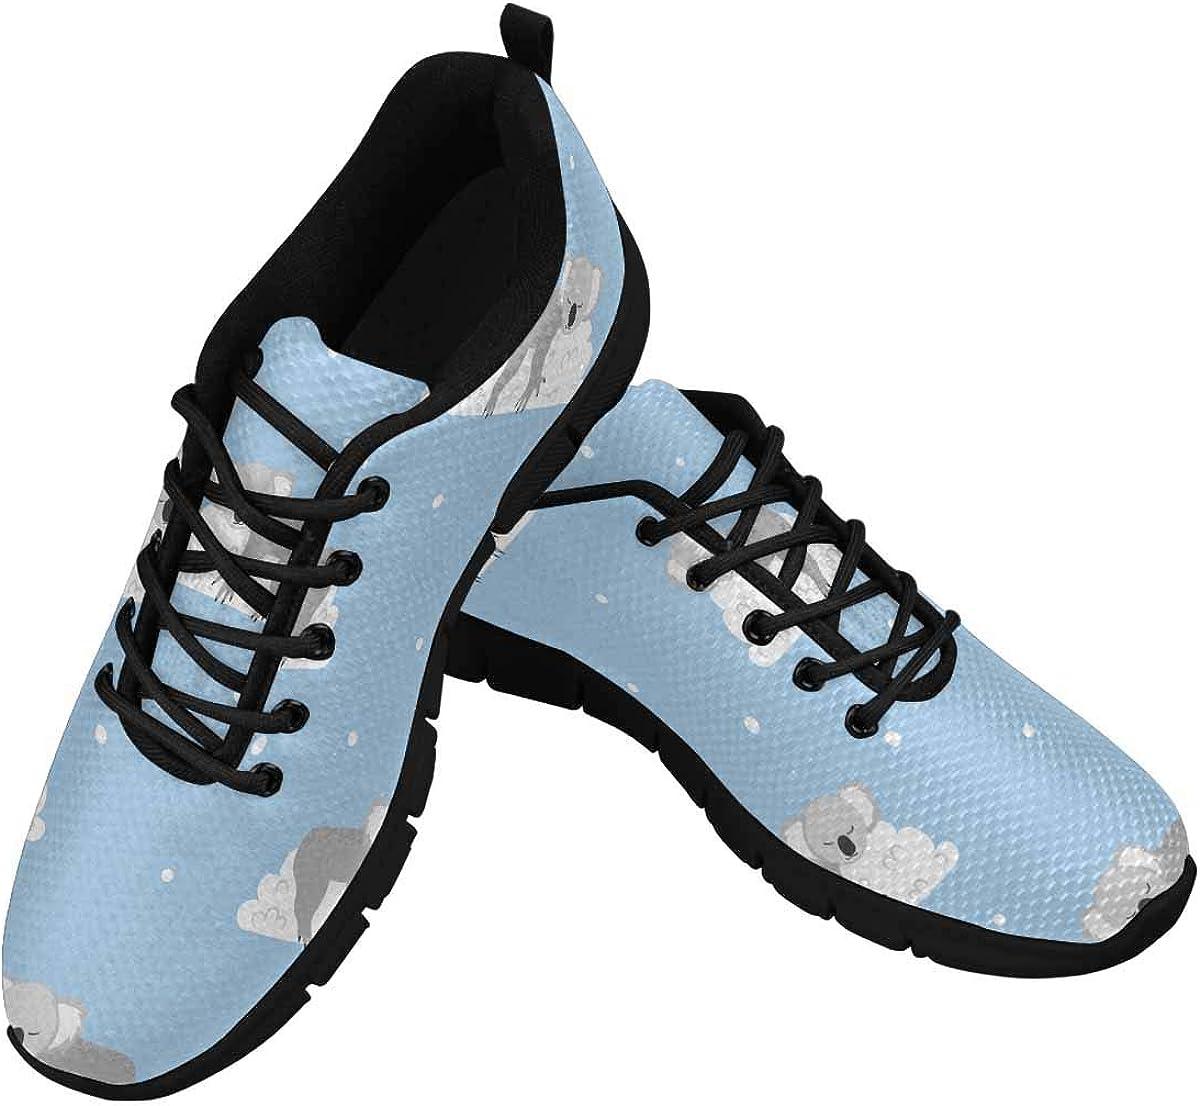 InterestPrint Cute Sleeping Koala Bears Women's Walking Shoes Lightweight Casual Running Sneakers